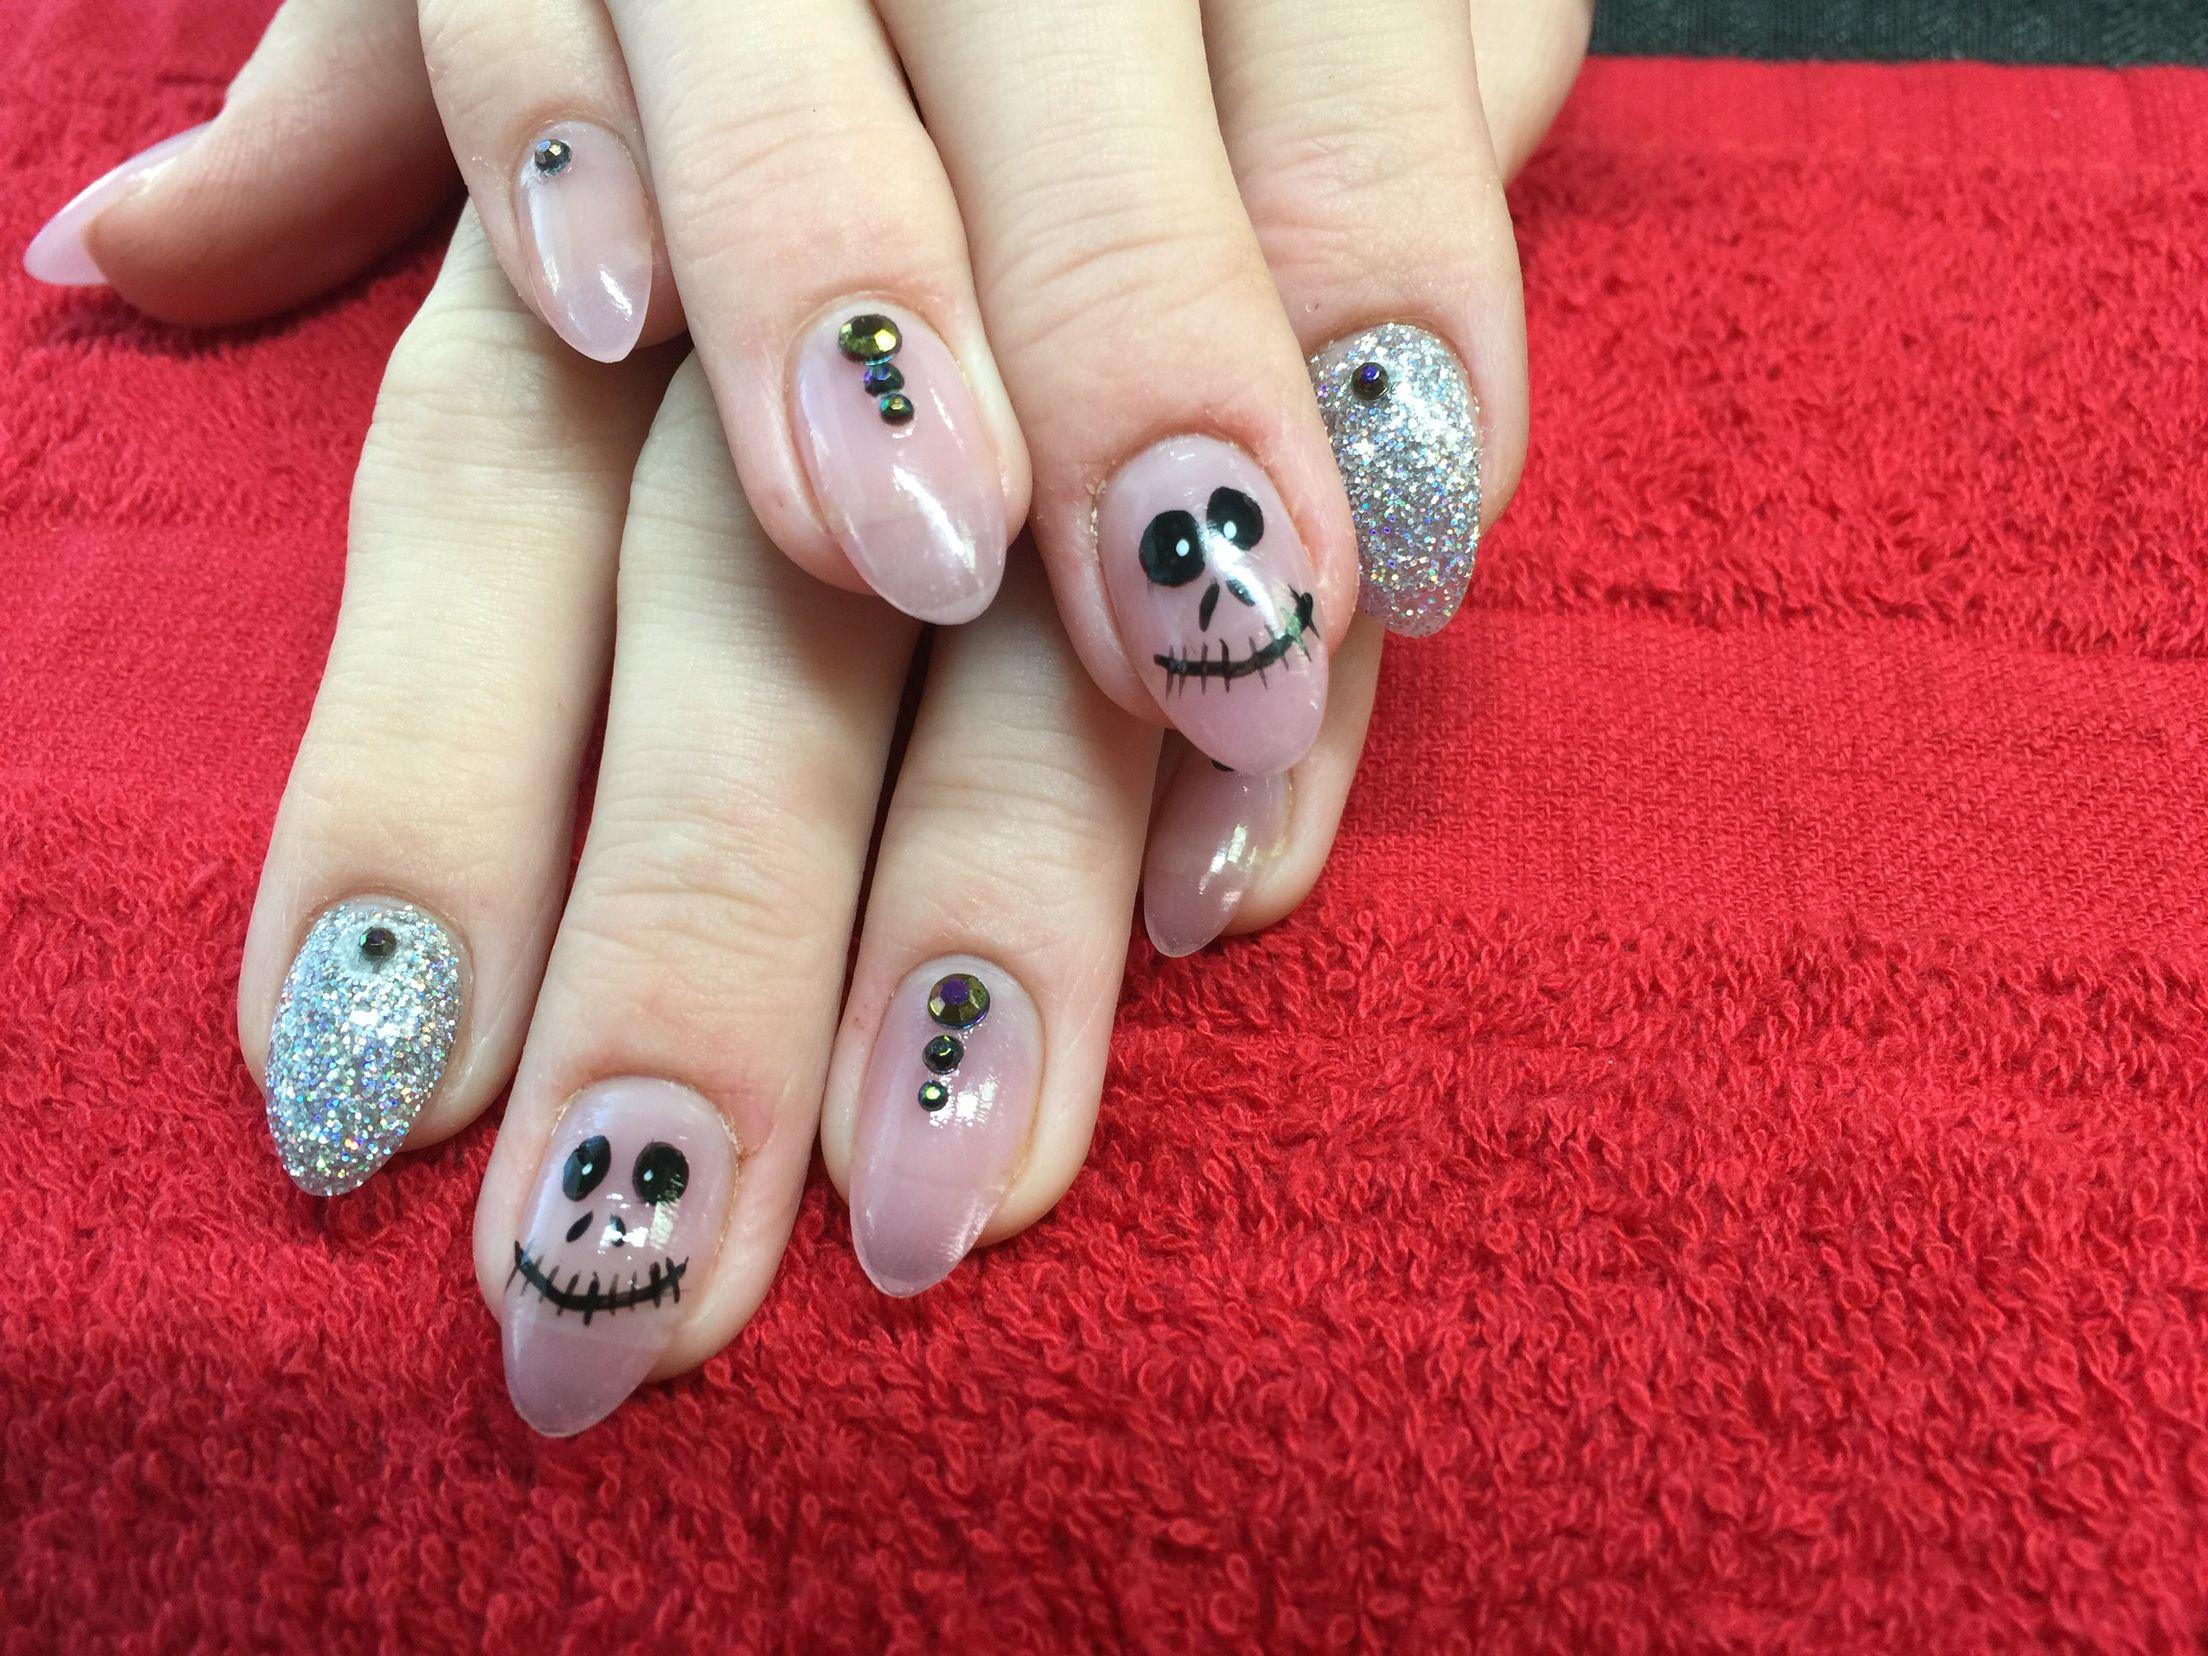 alchemystudio20 Jack Skeleton Nails #halloween #nails #glitter #jack ...